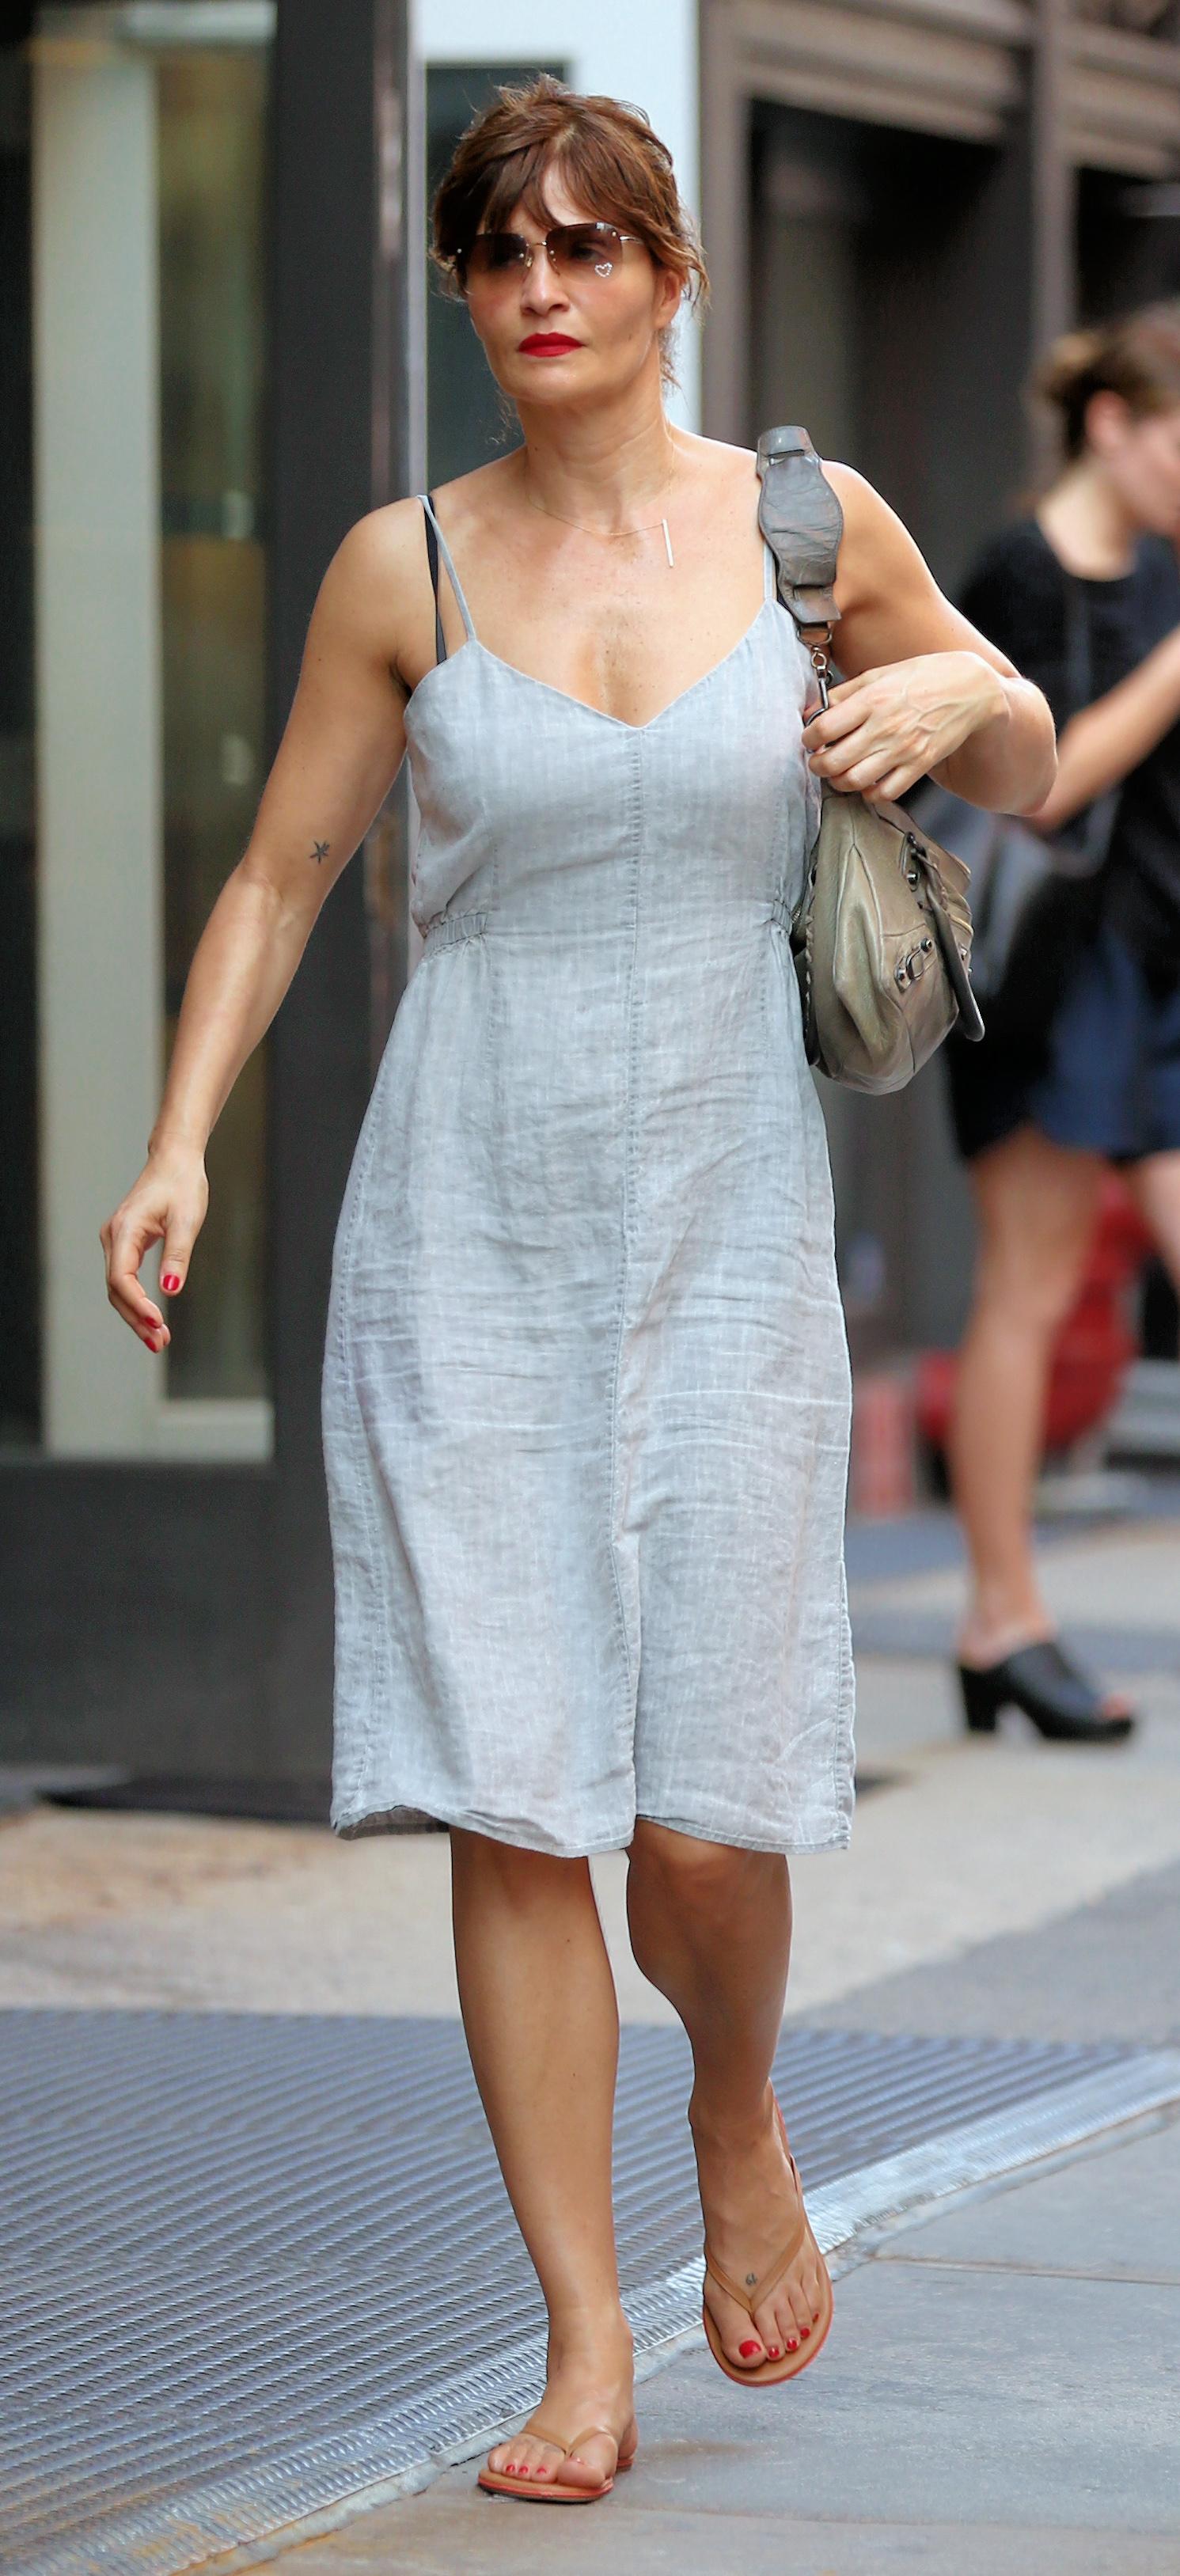 Paparazzi Helena Christensen naked (54 photos), Topless, Cleavage, Selfie, bra 2020